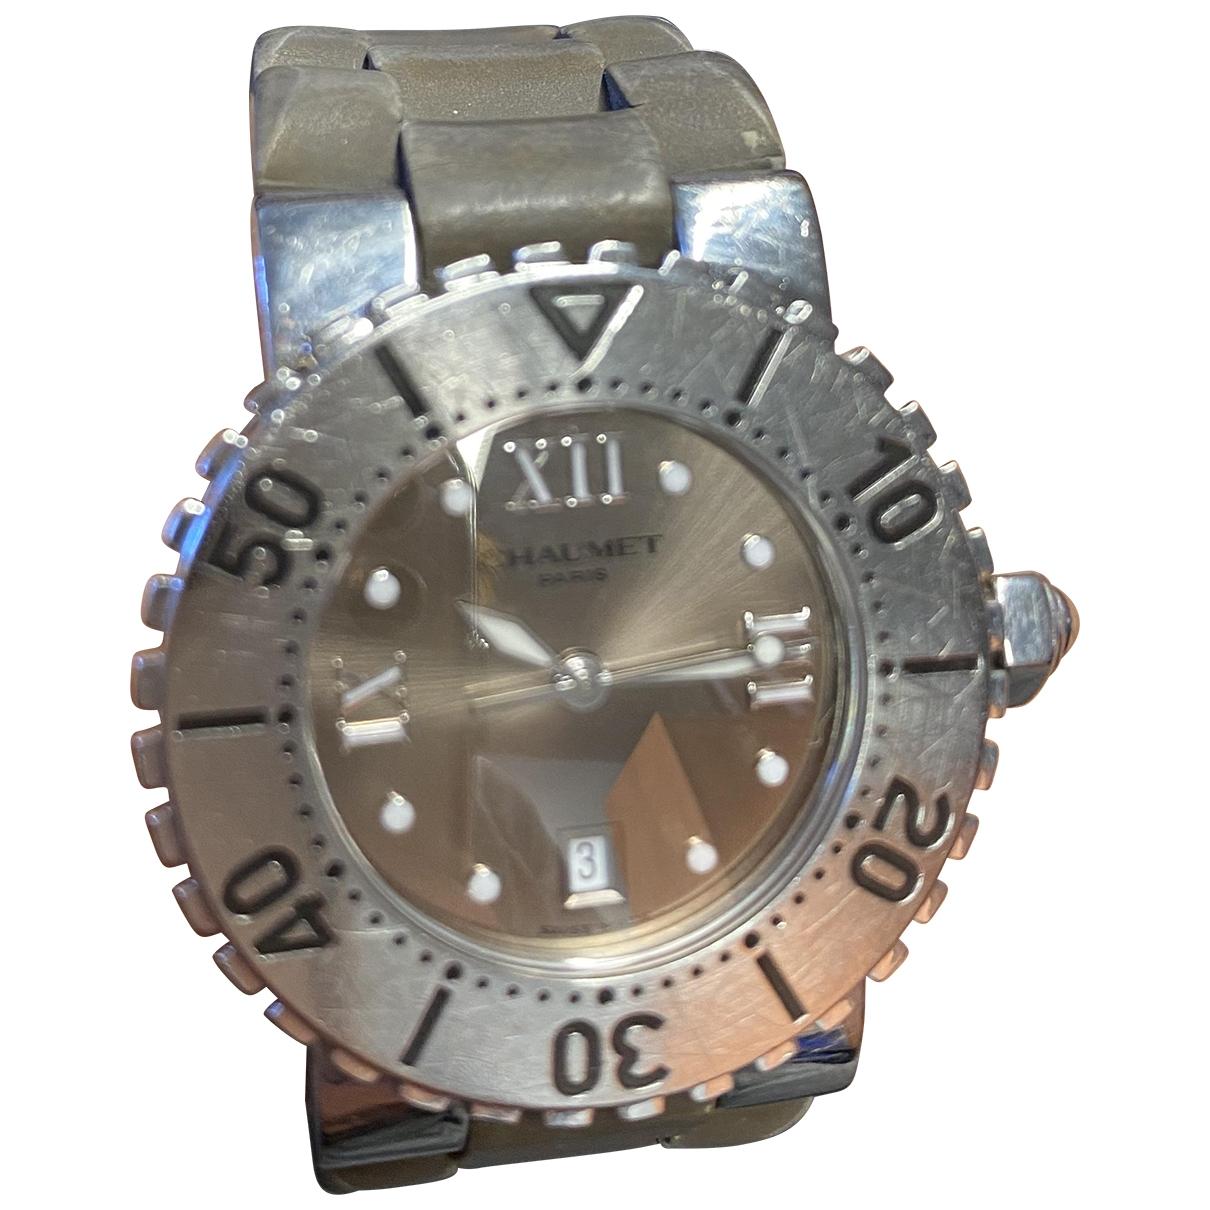 Reloj Class One  Chaumet